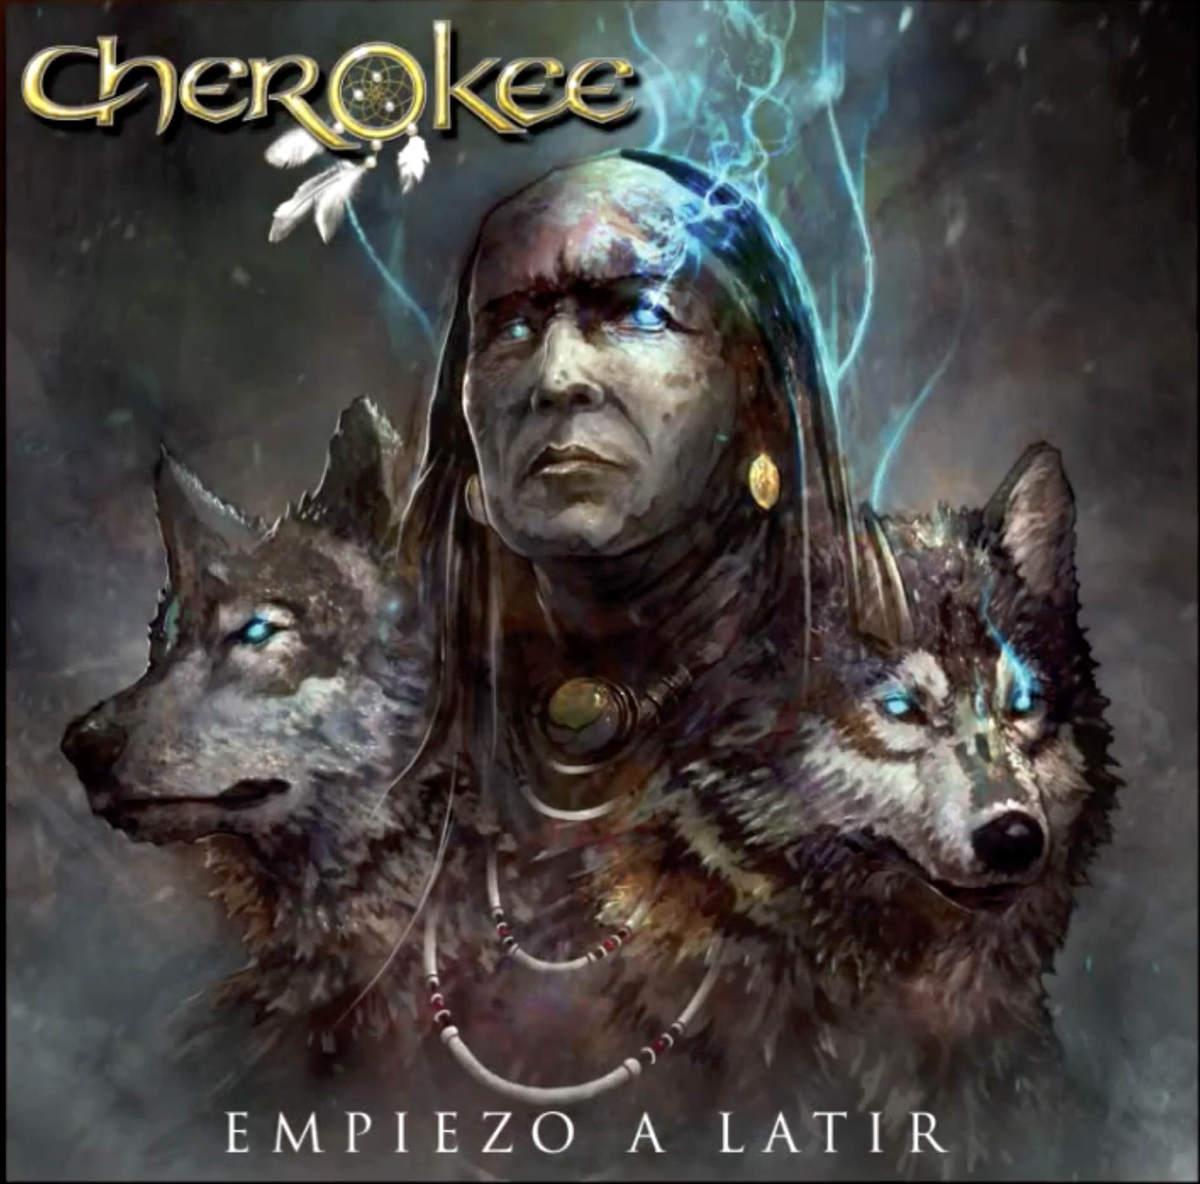 CHEROKEE – Empiezo a latir, 2015